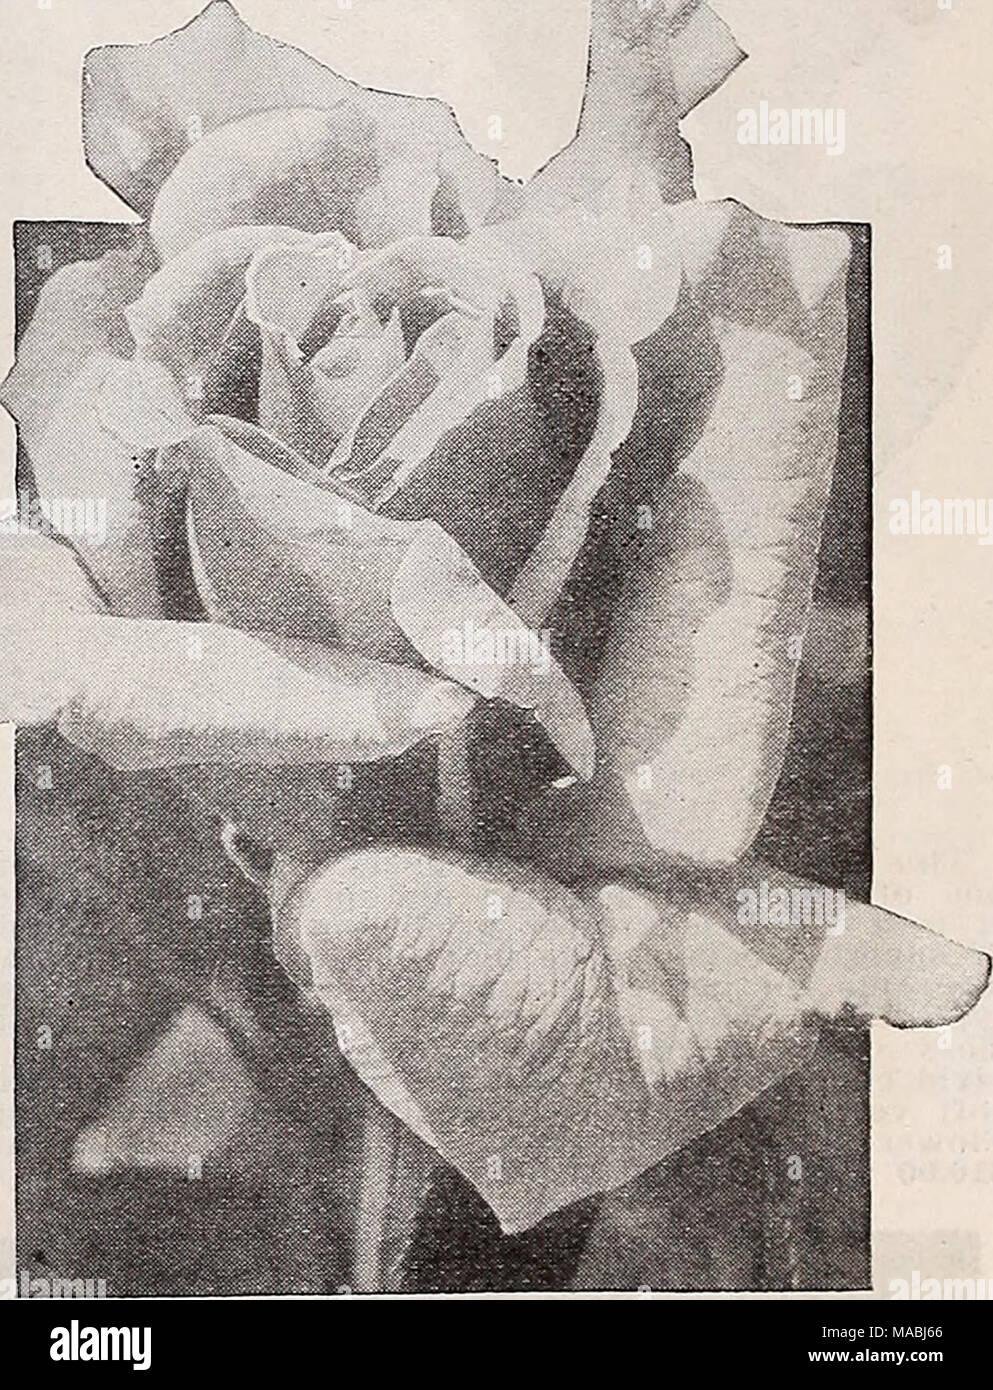 Dreers Wholesale Price List For Florists Bulbs Garden